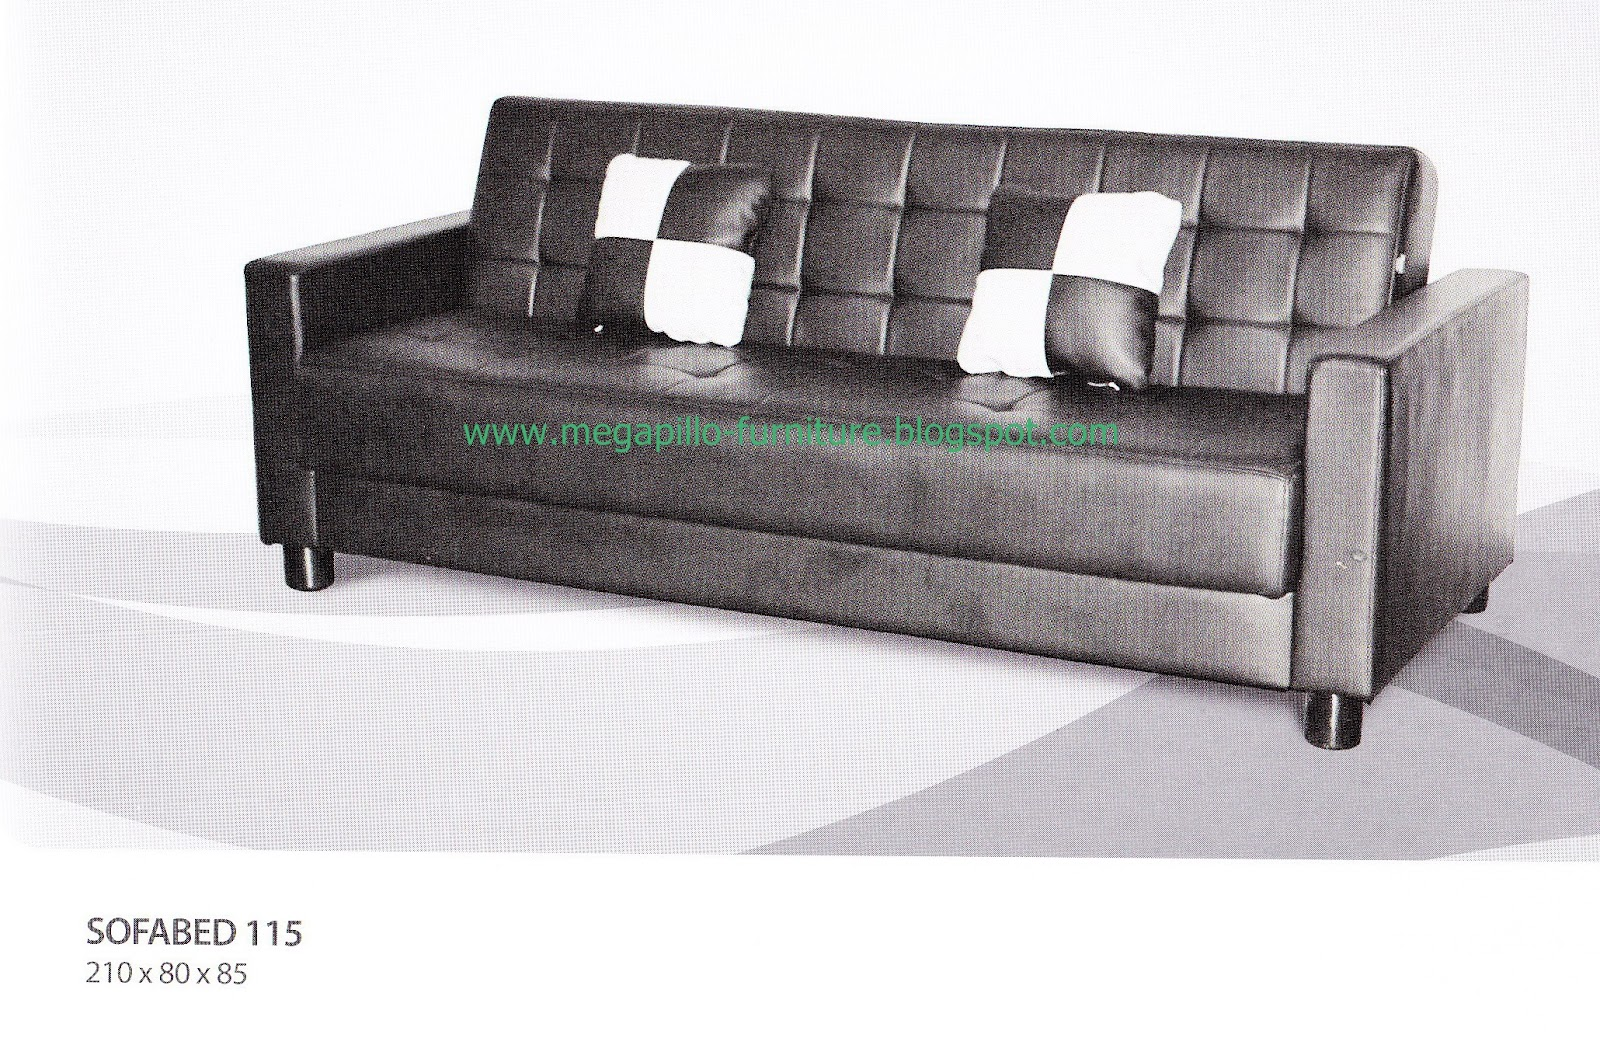 Sofa Bed Morres